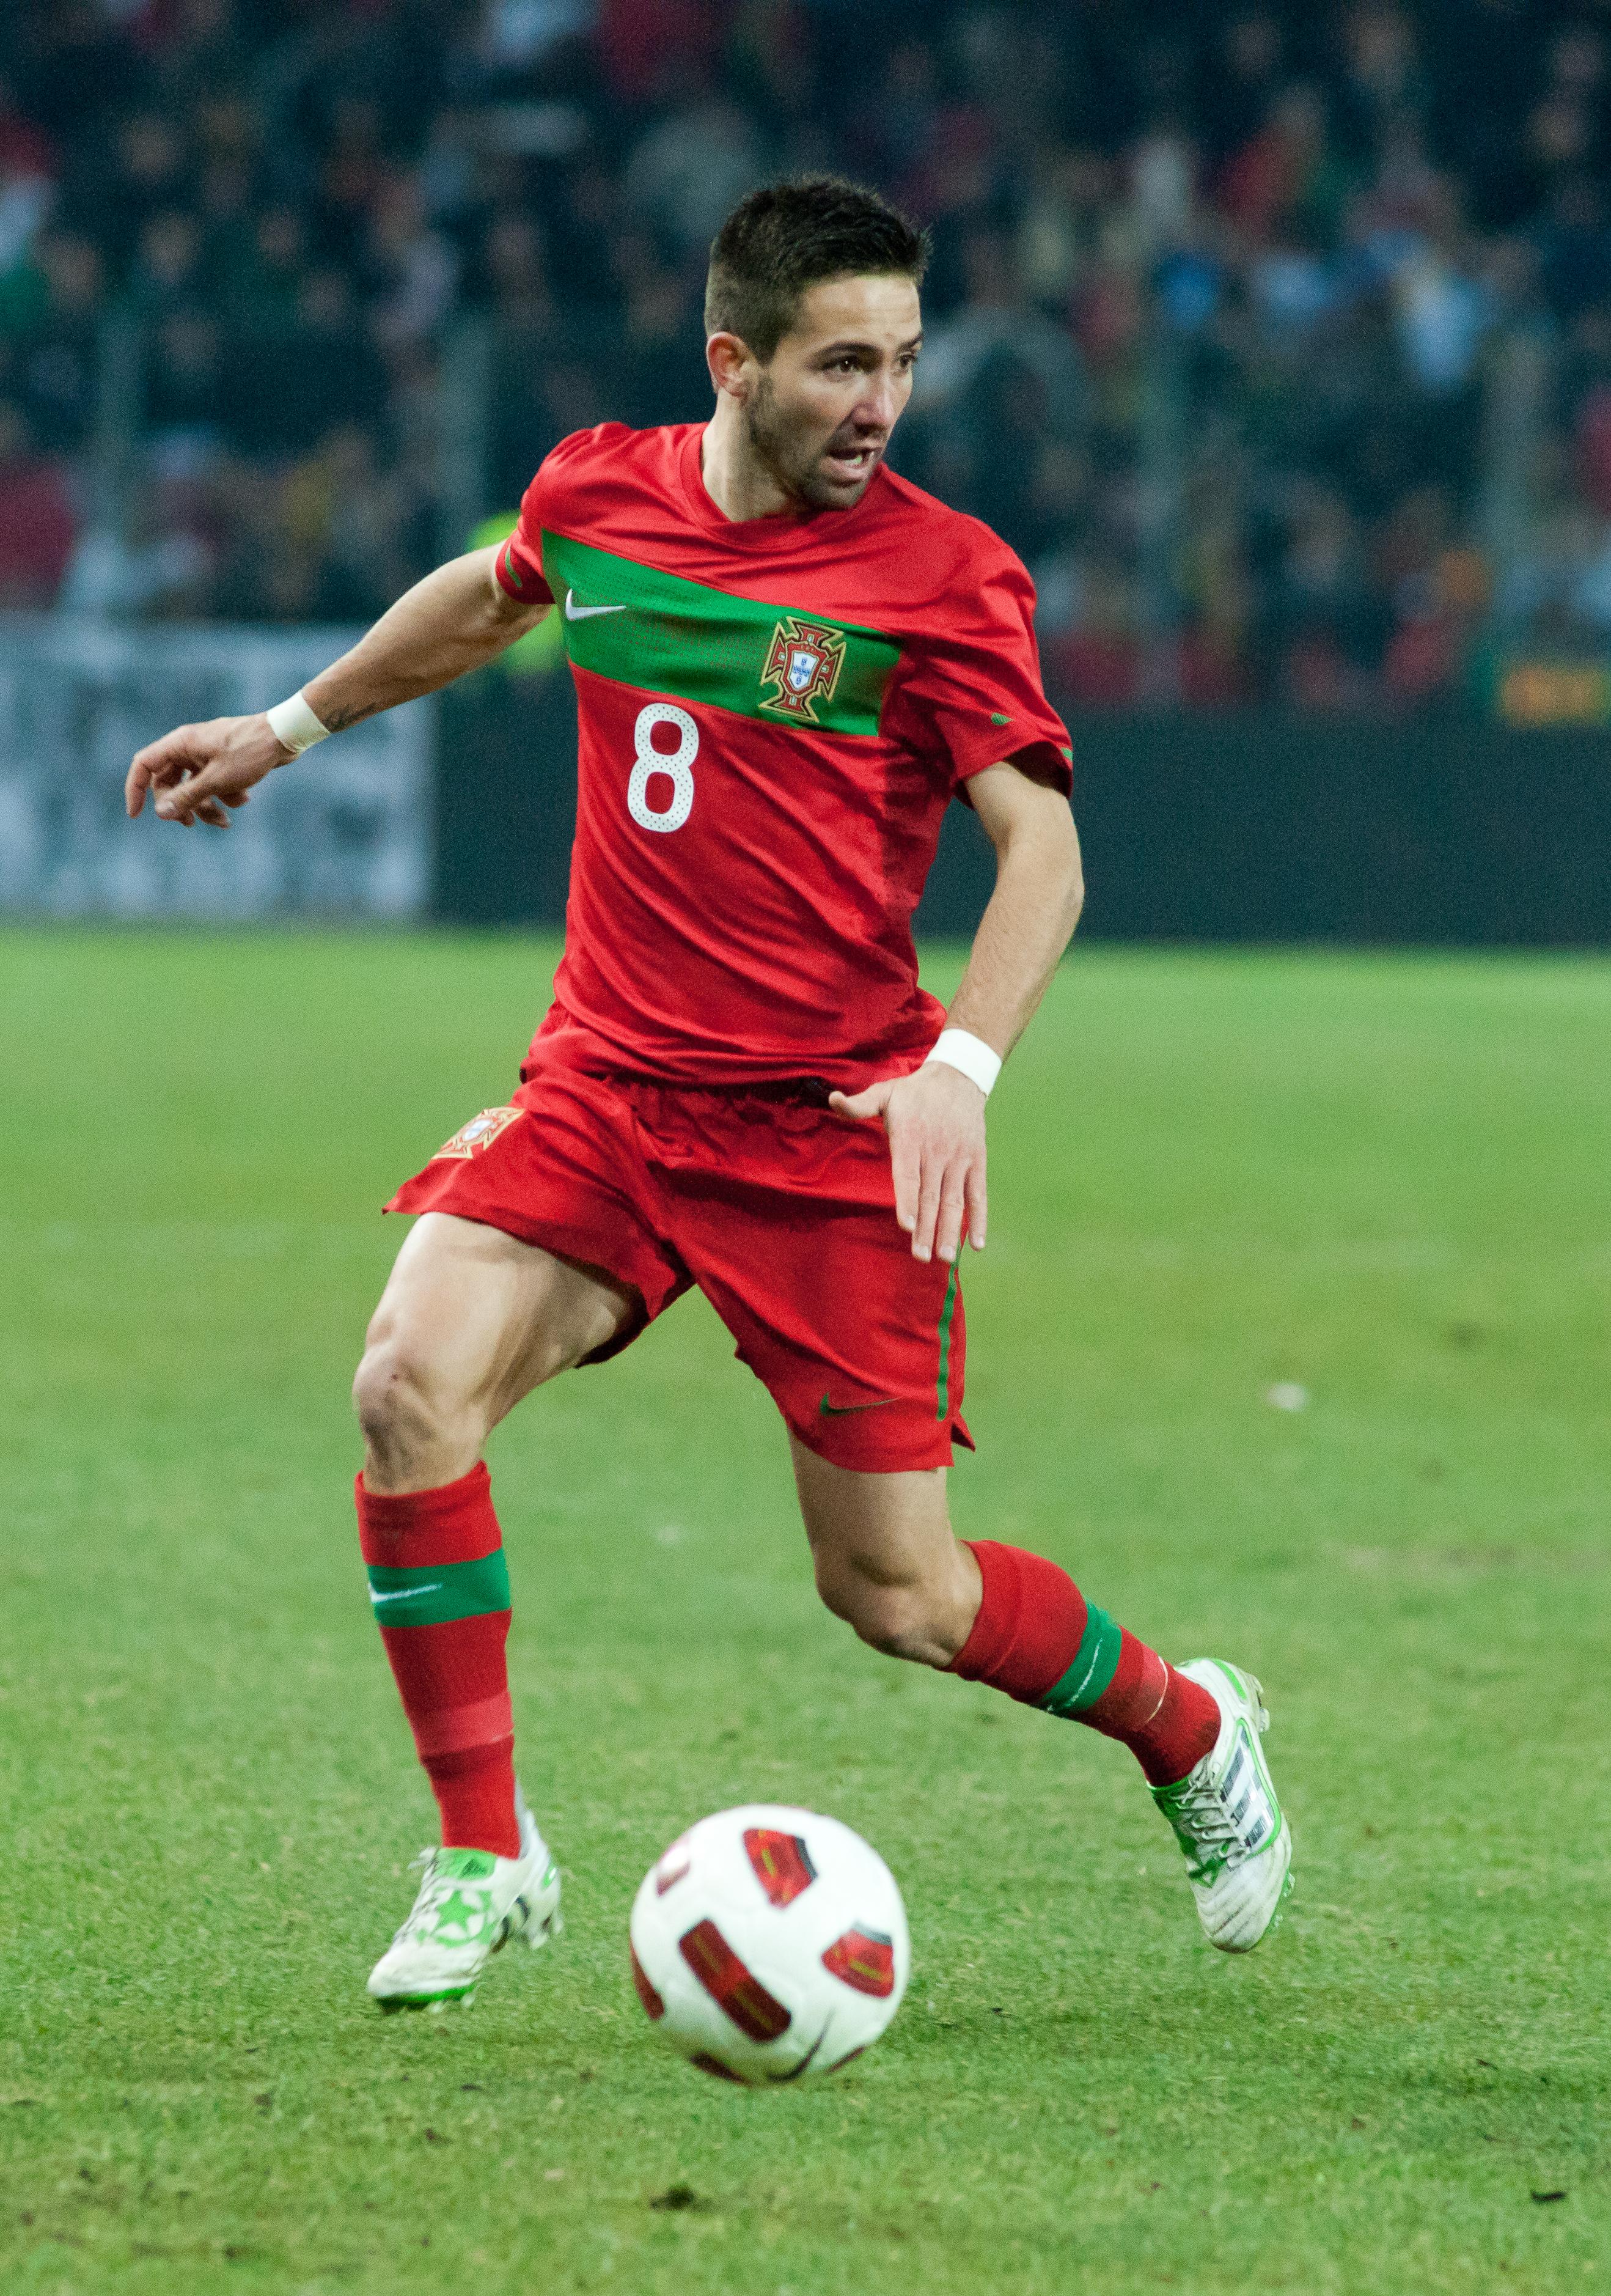 File Joao Moutinho – Portugal vs Argentina 9th February 2011 1